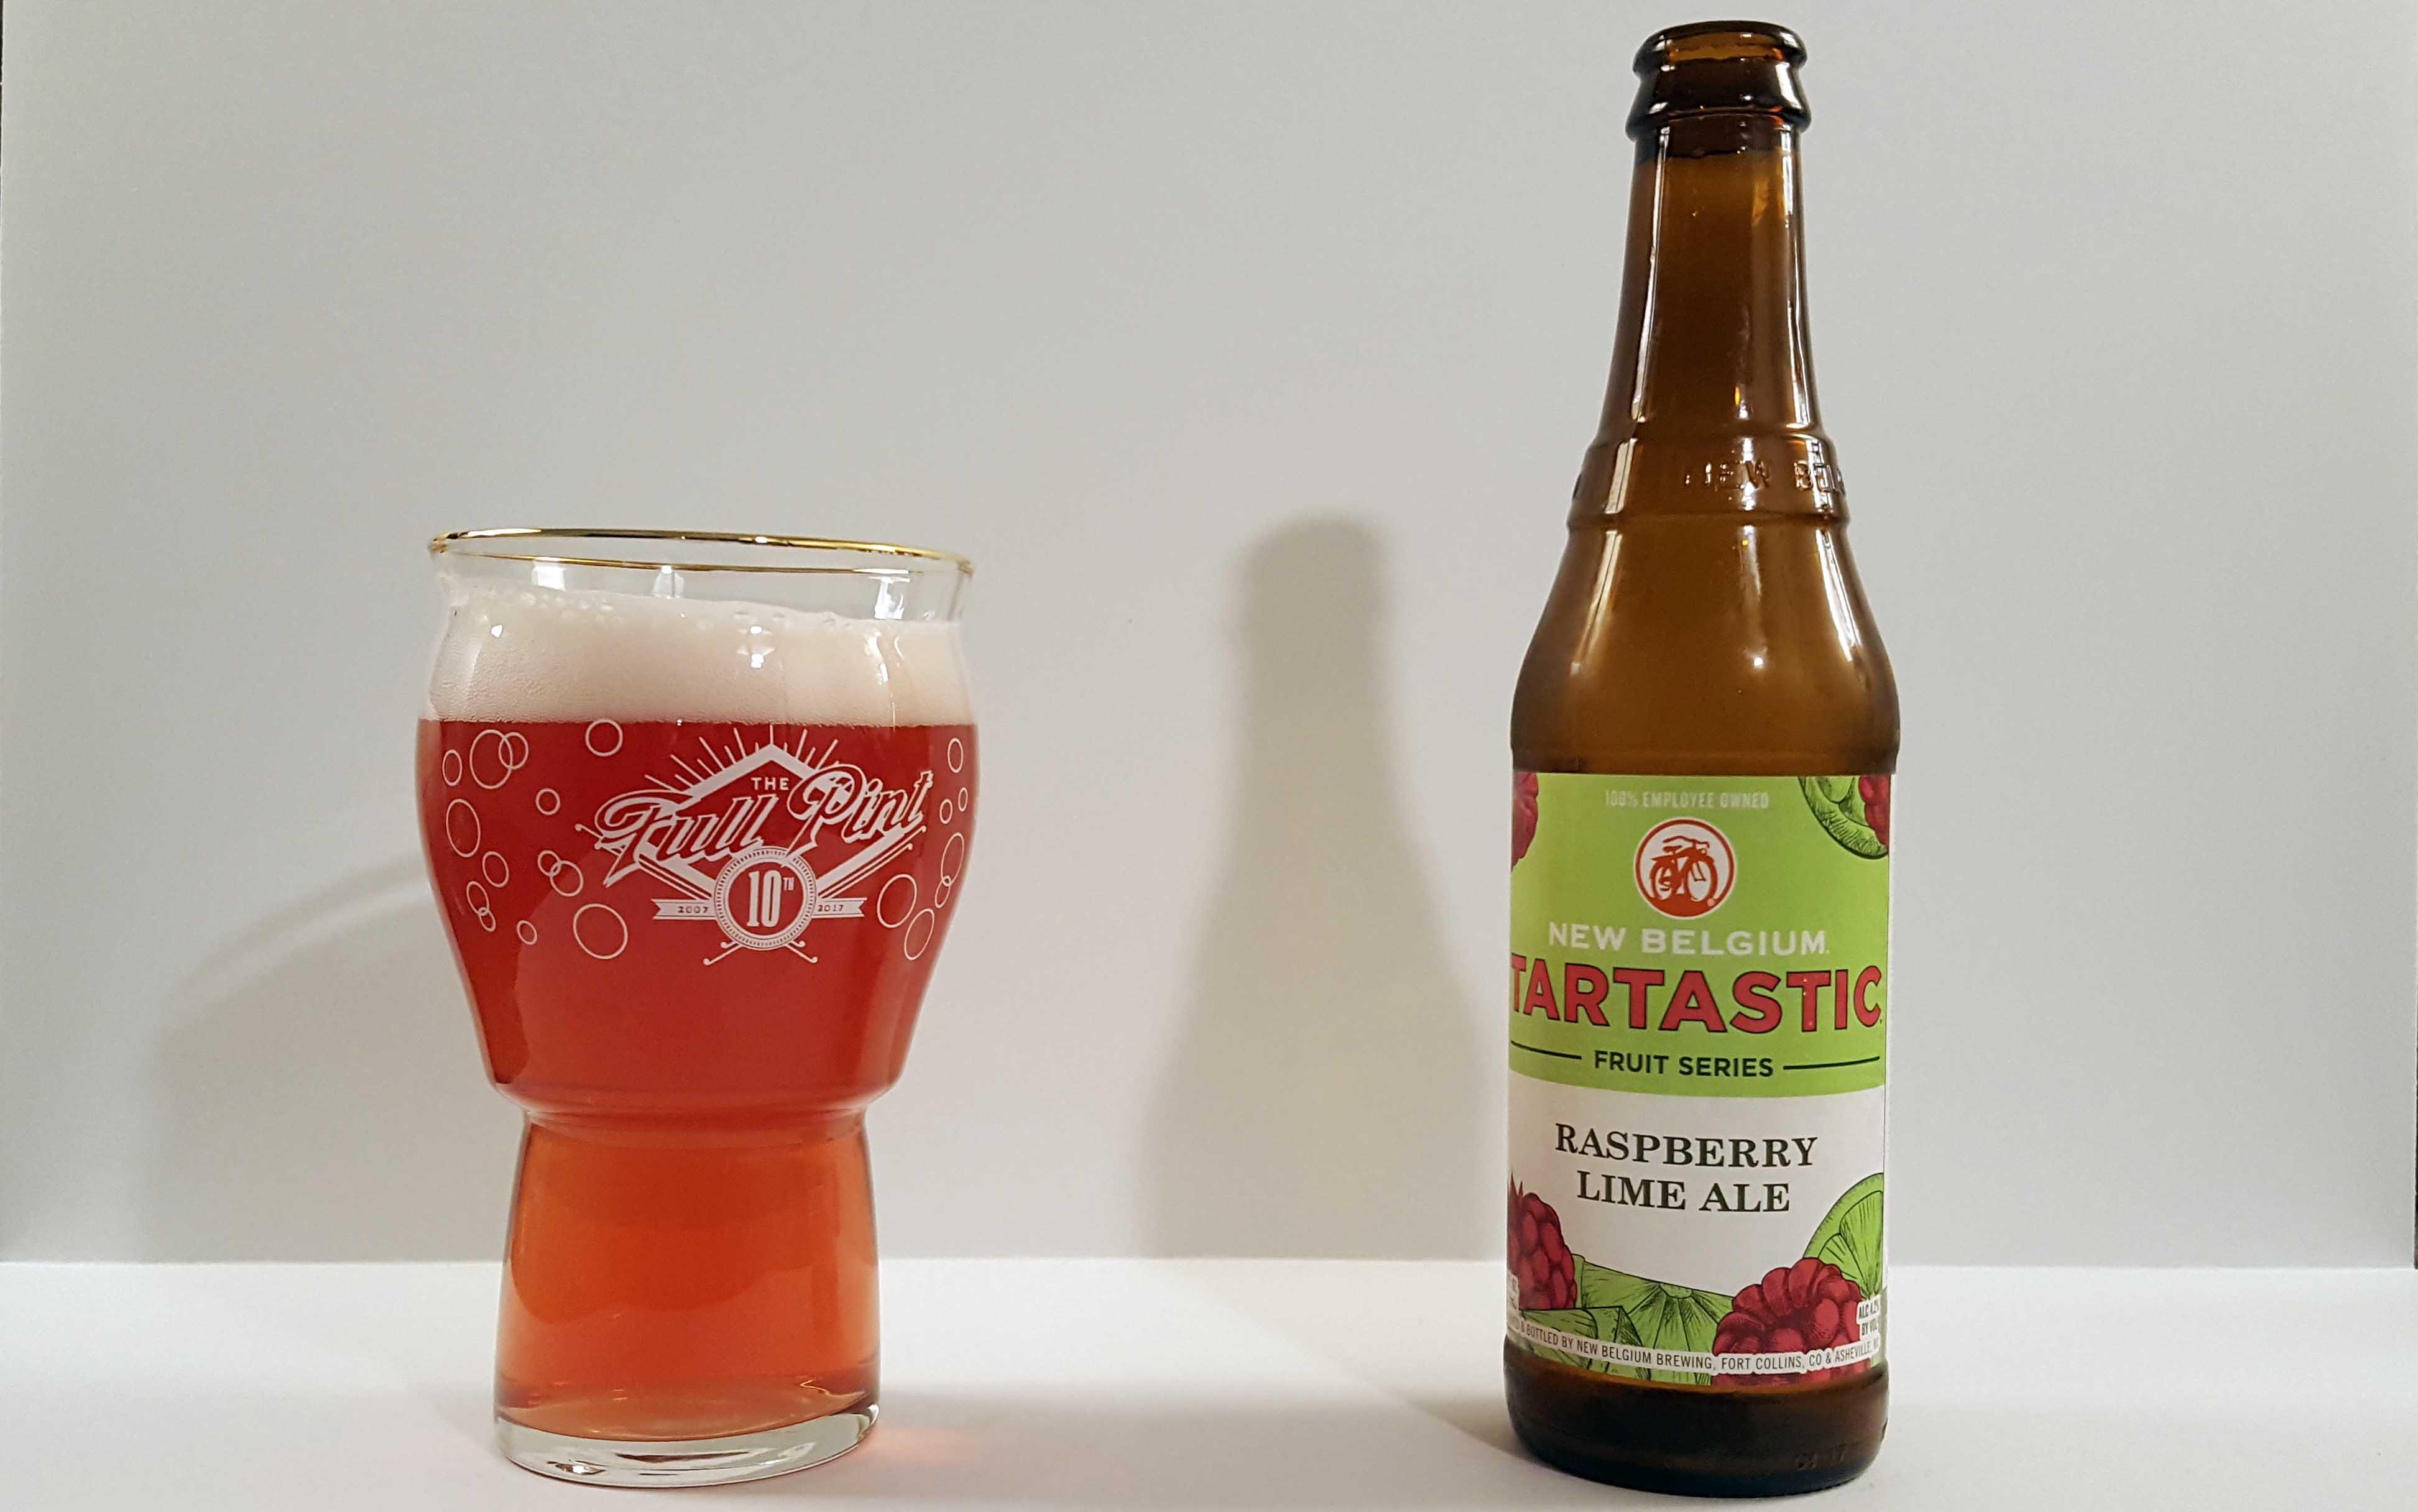 New Belgium Tartastic Raspberry Lime Ale